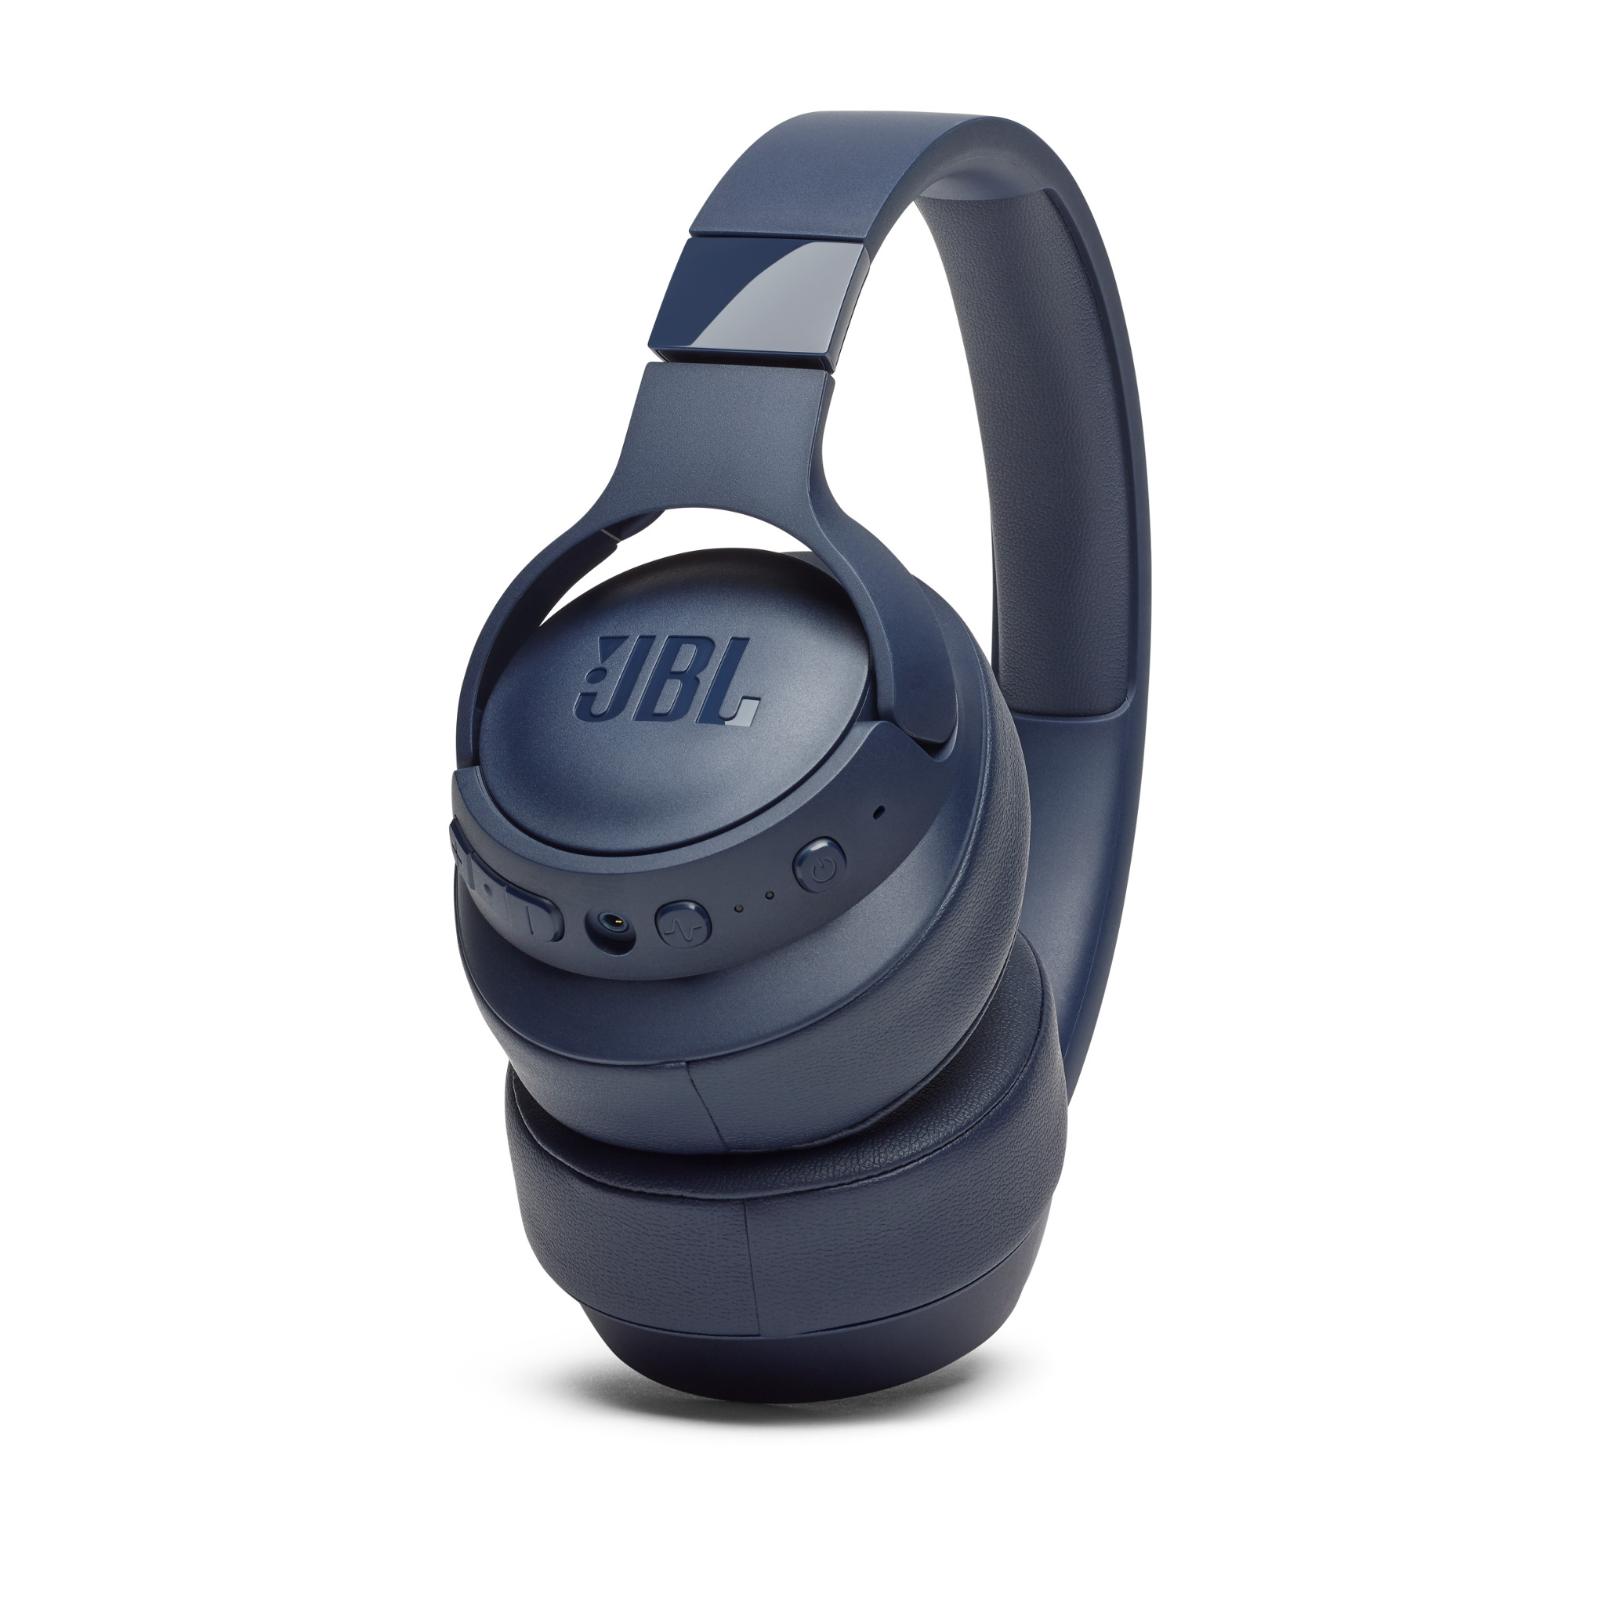 JBL TUNE 750BTNC - Blue - Wireless Over-Ear ANC Headphones - Detailshot 6